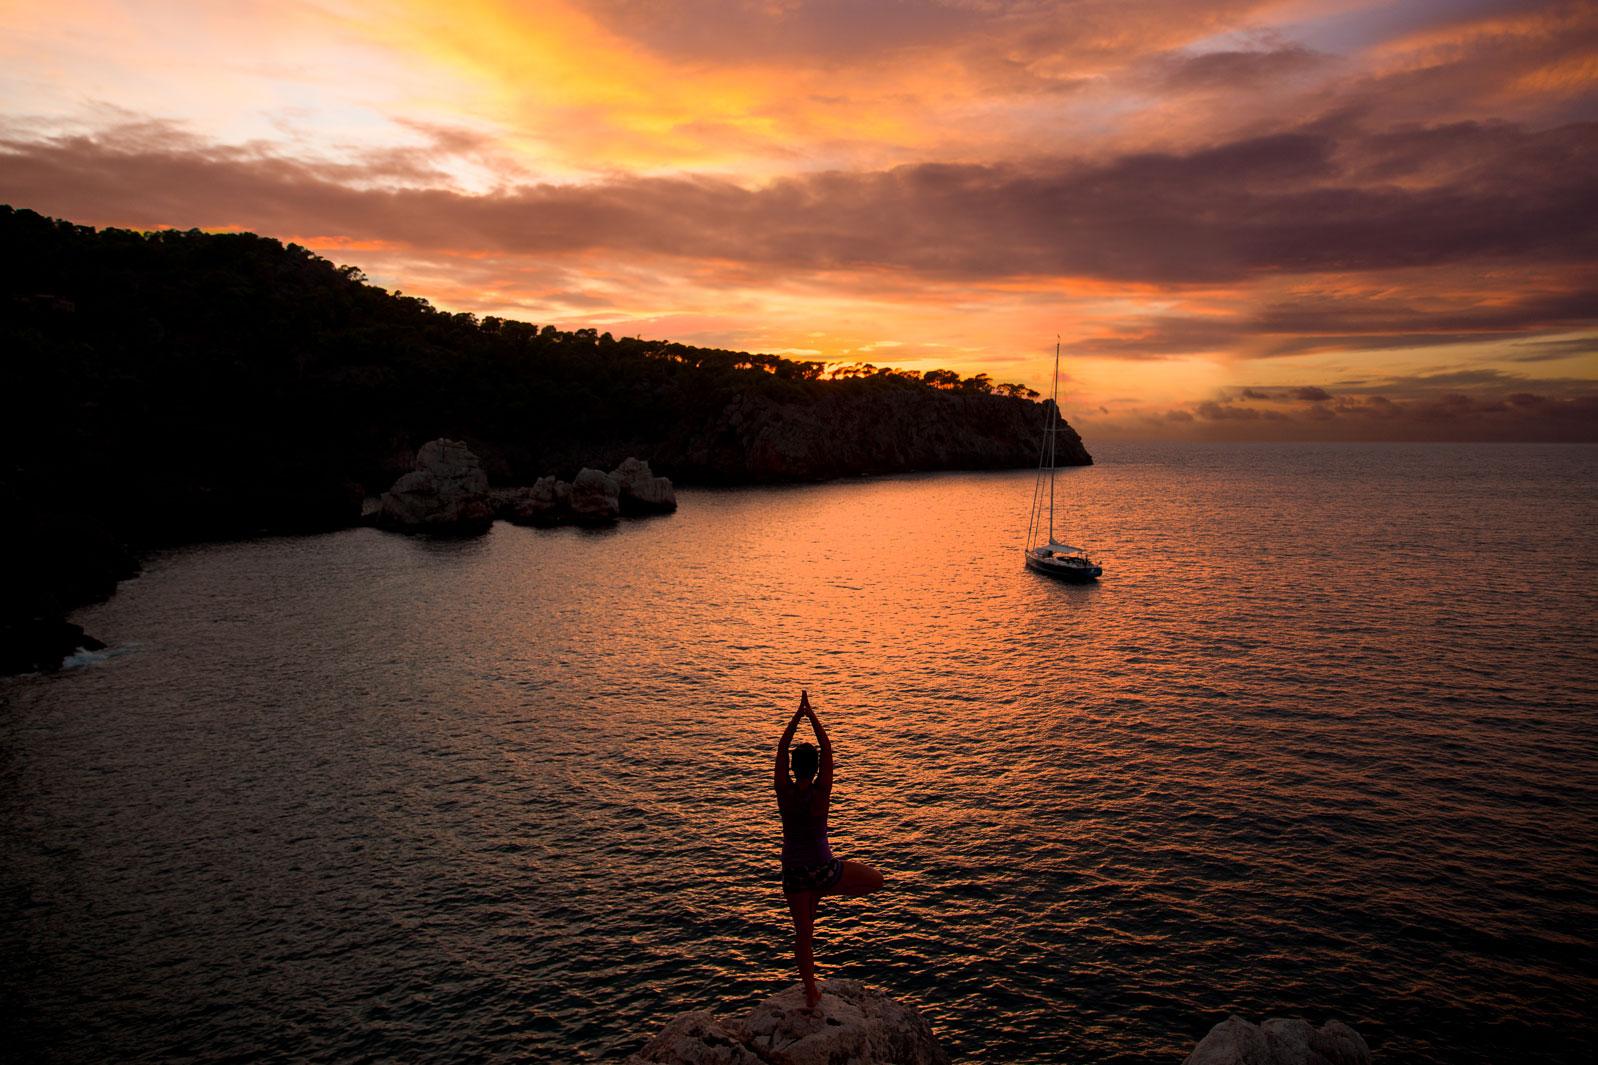 170903_Yoga-Marisol_238_cc-(RGB)_by-Lina-Schuetze_web